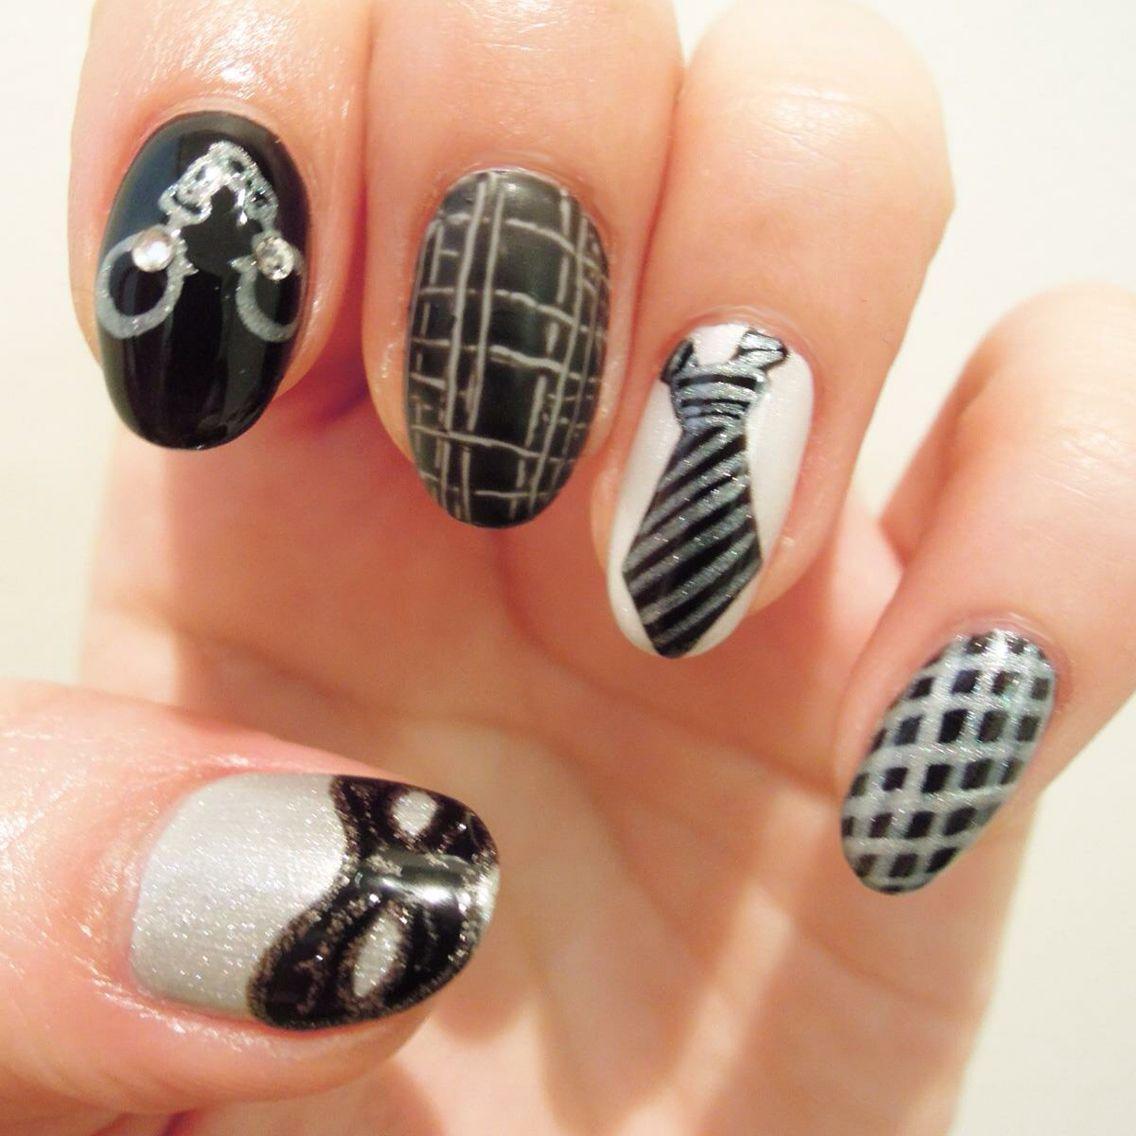 50 Shades of Grey Nails | Inspo nails - Pattern | Pinterest